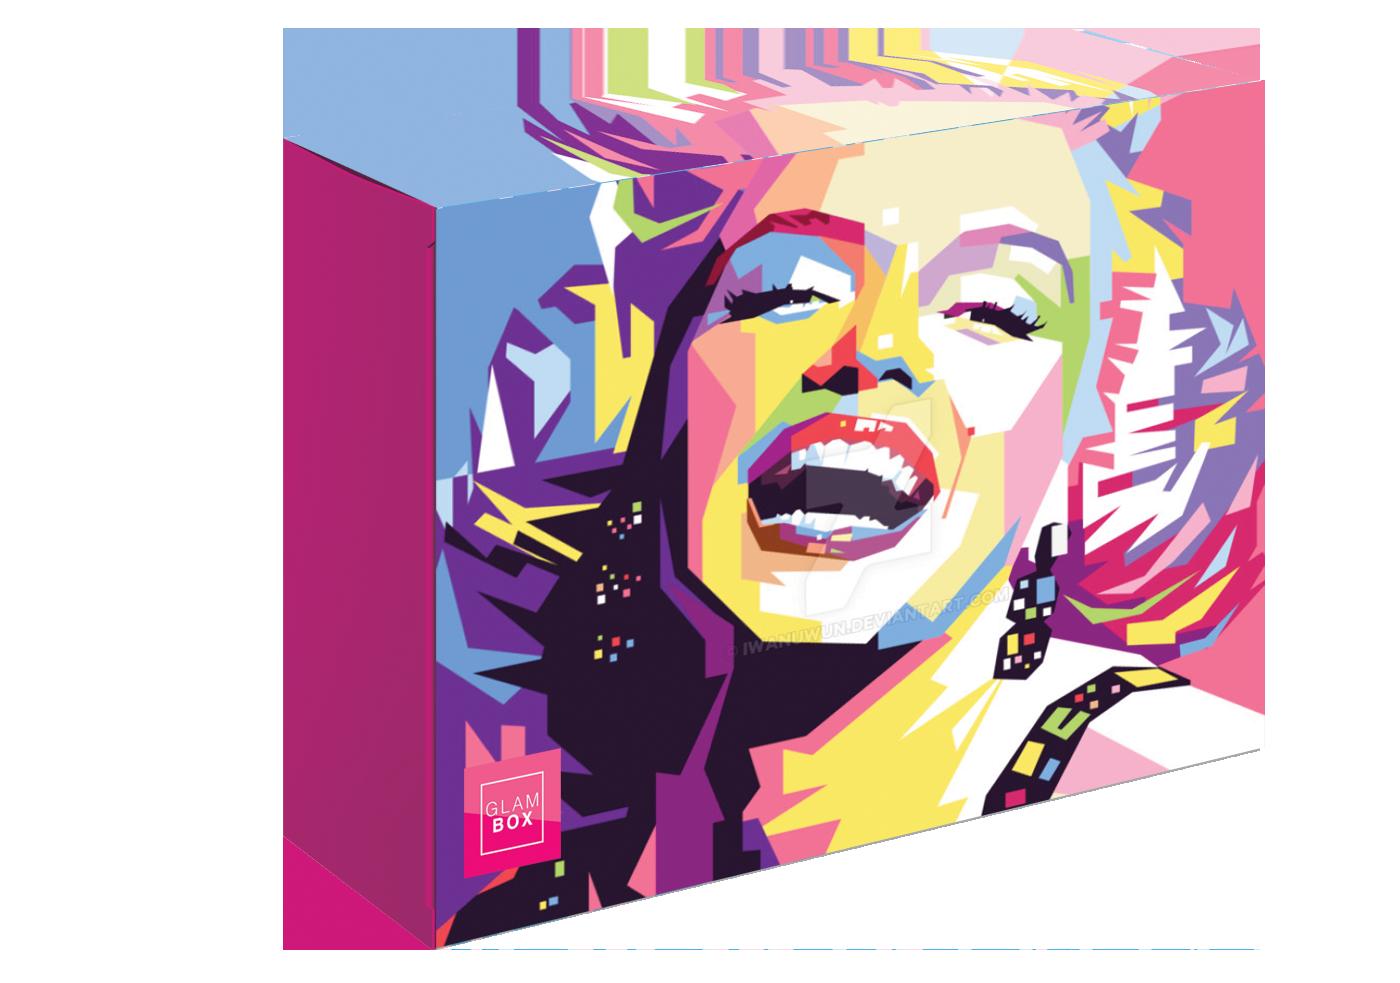 Box_pop art 2.png